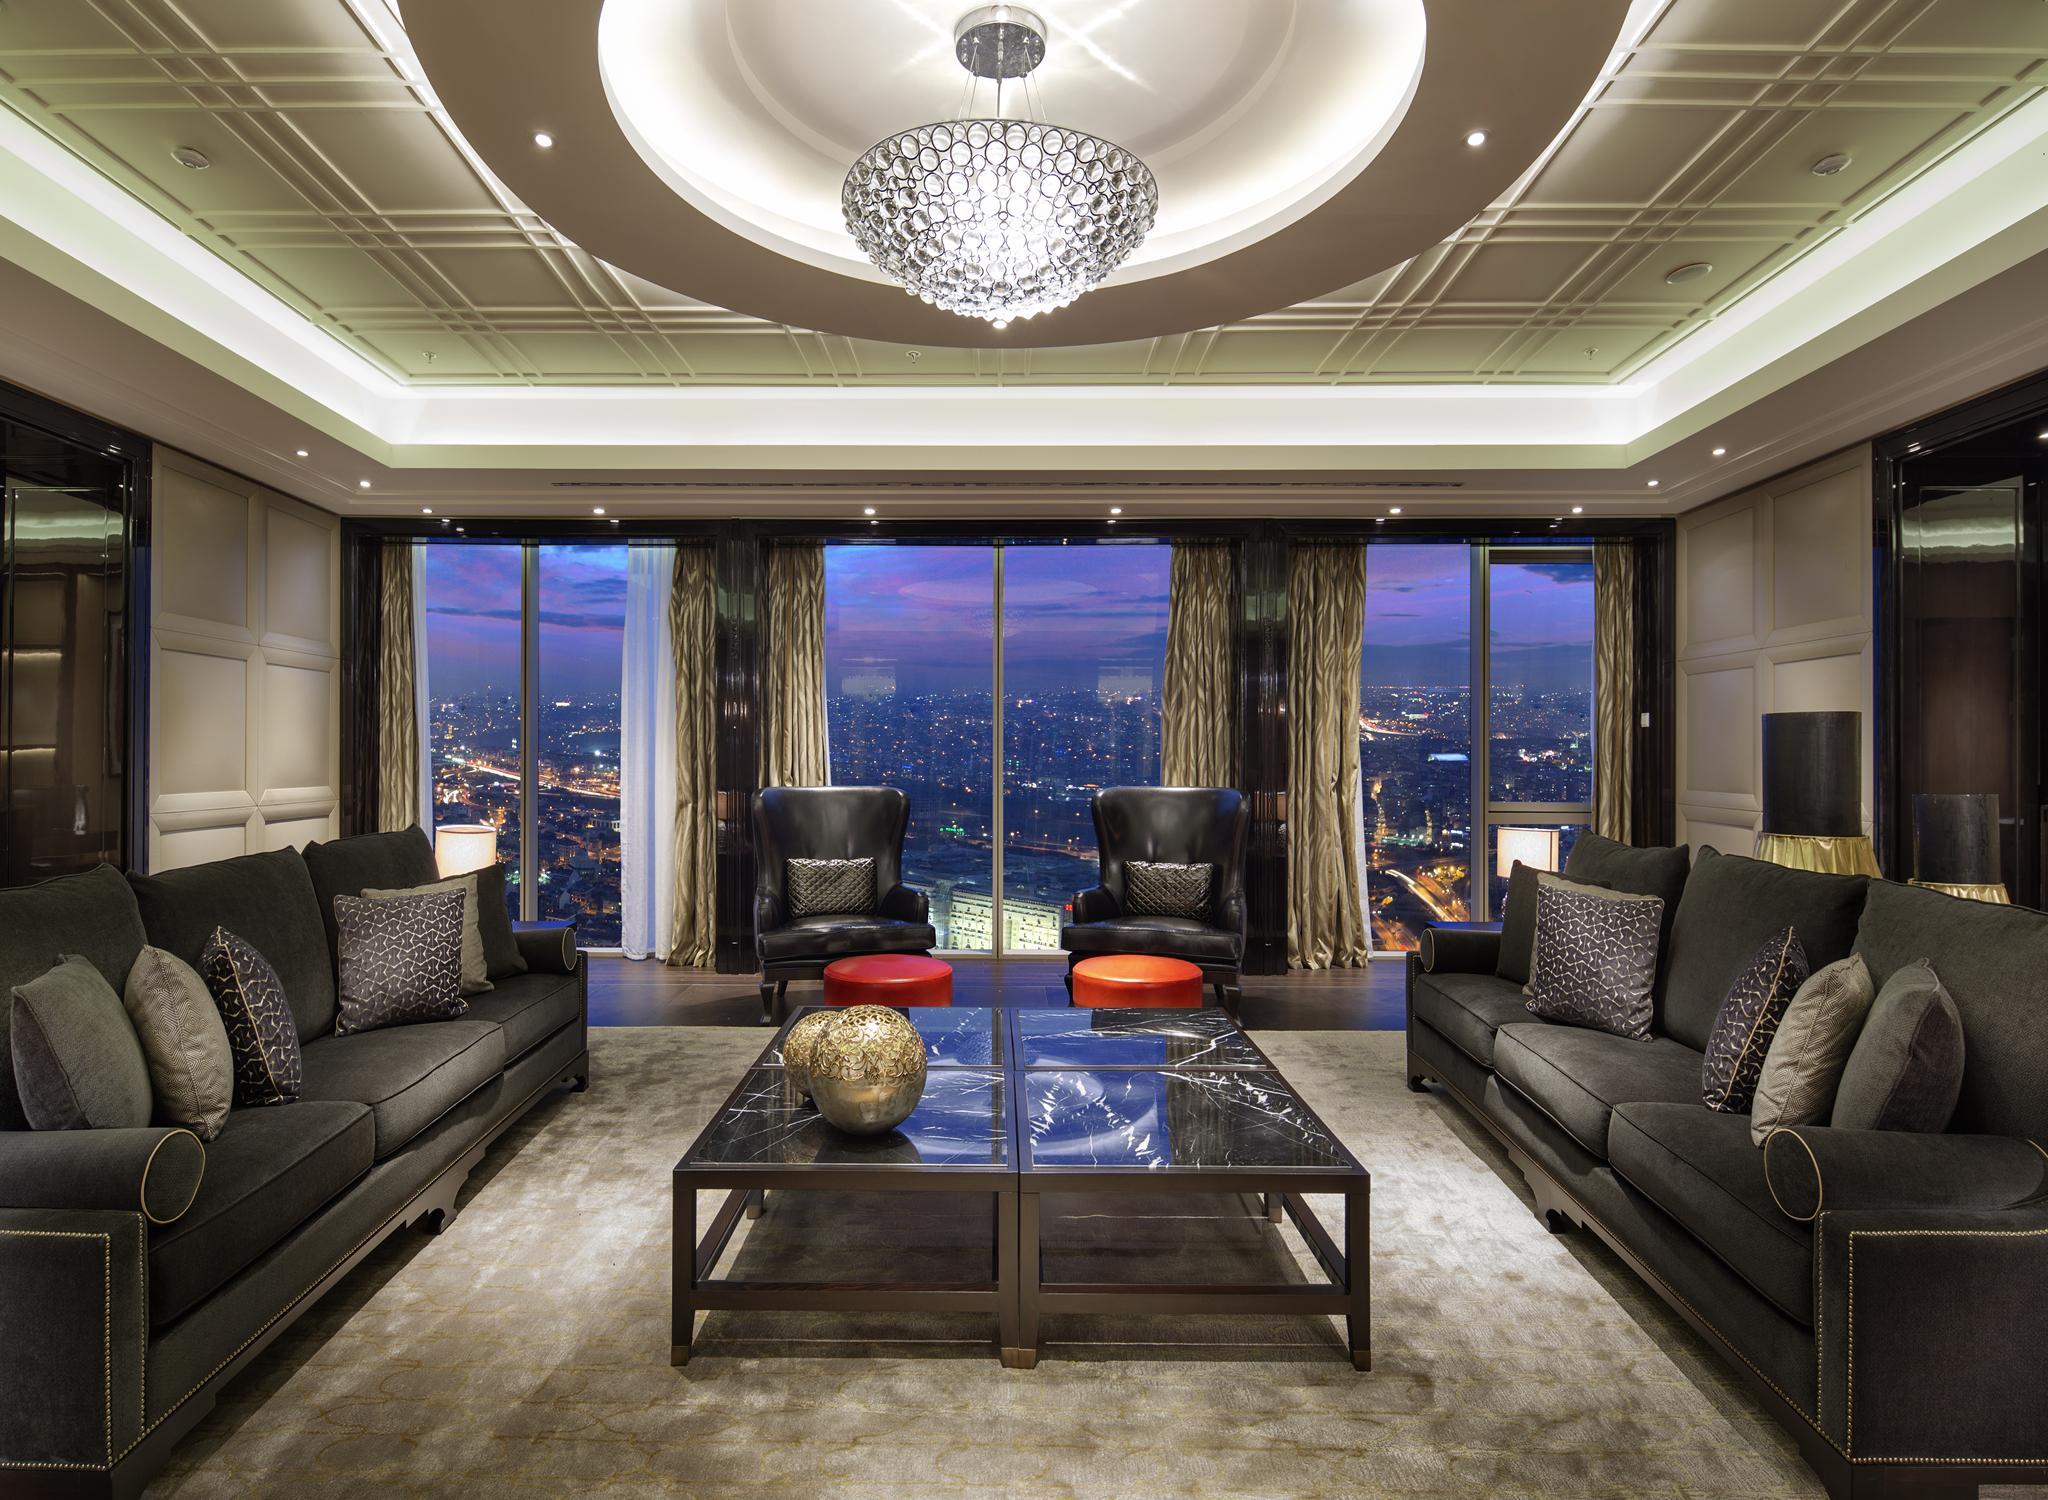 Istanbul Sisli Hotels Hilton Istanbul Bomonti Hotel